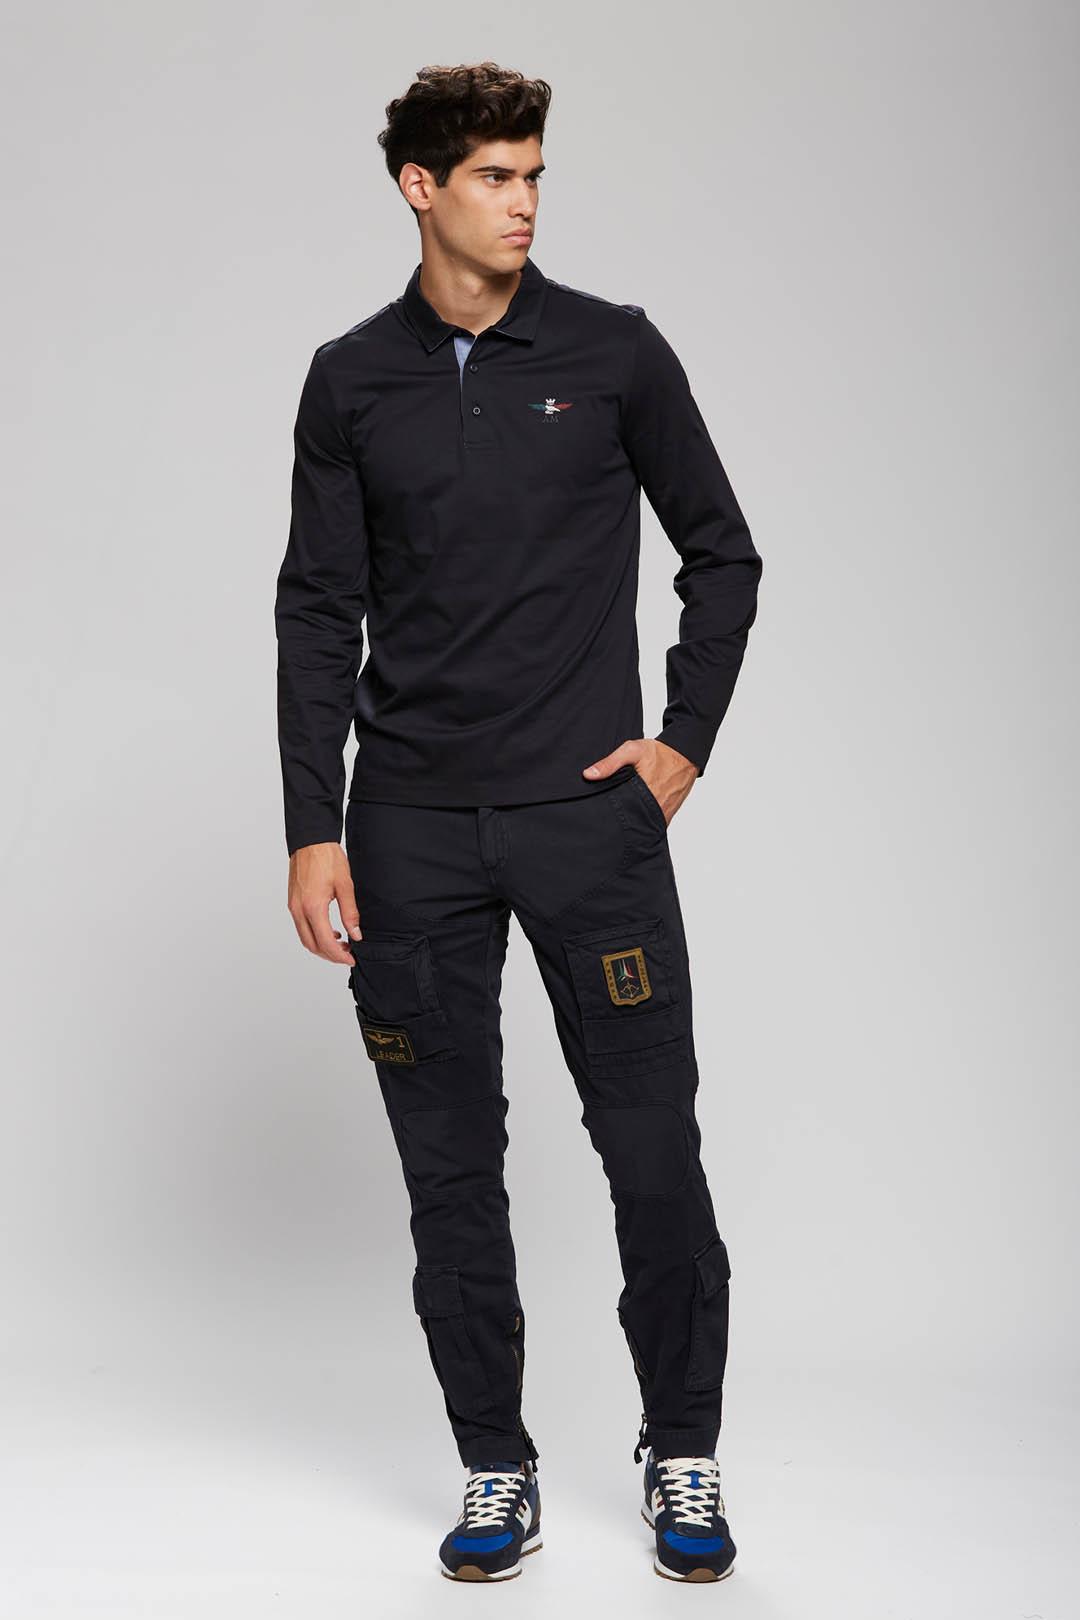 Poloshirt mit trikolorem Adler           4